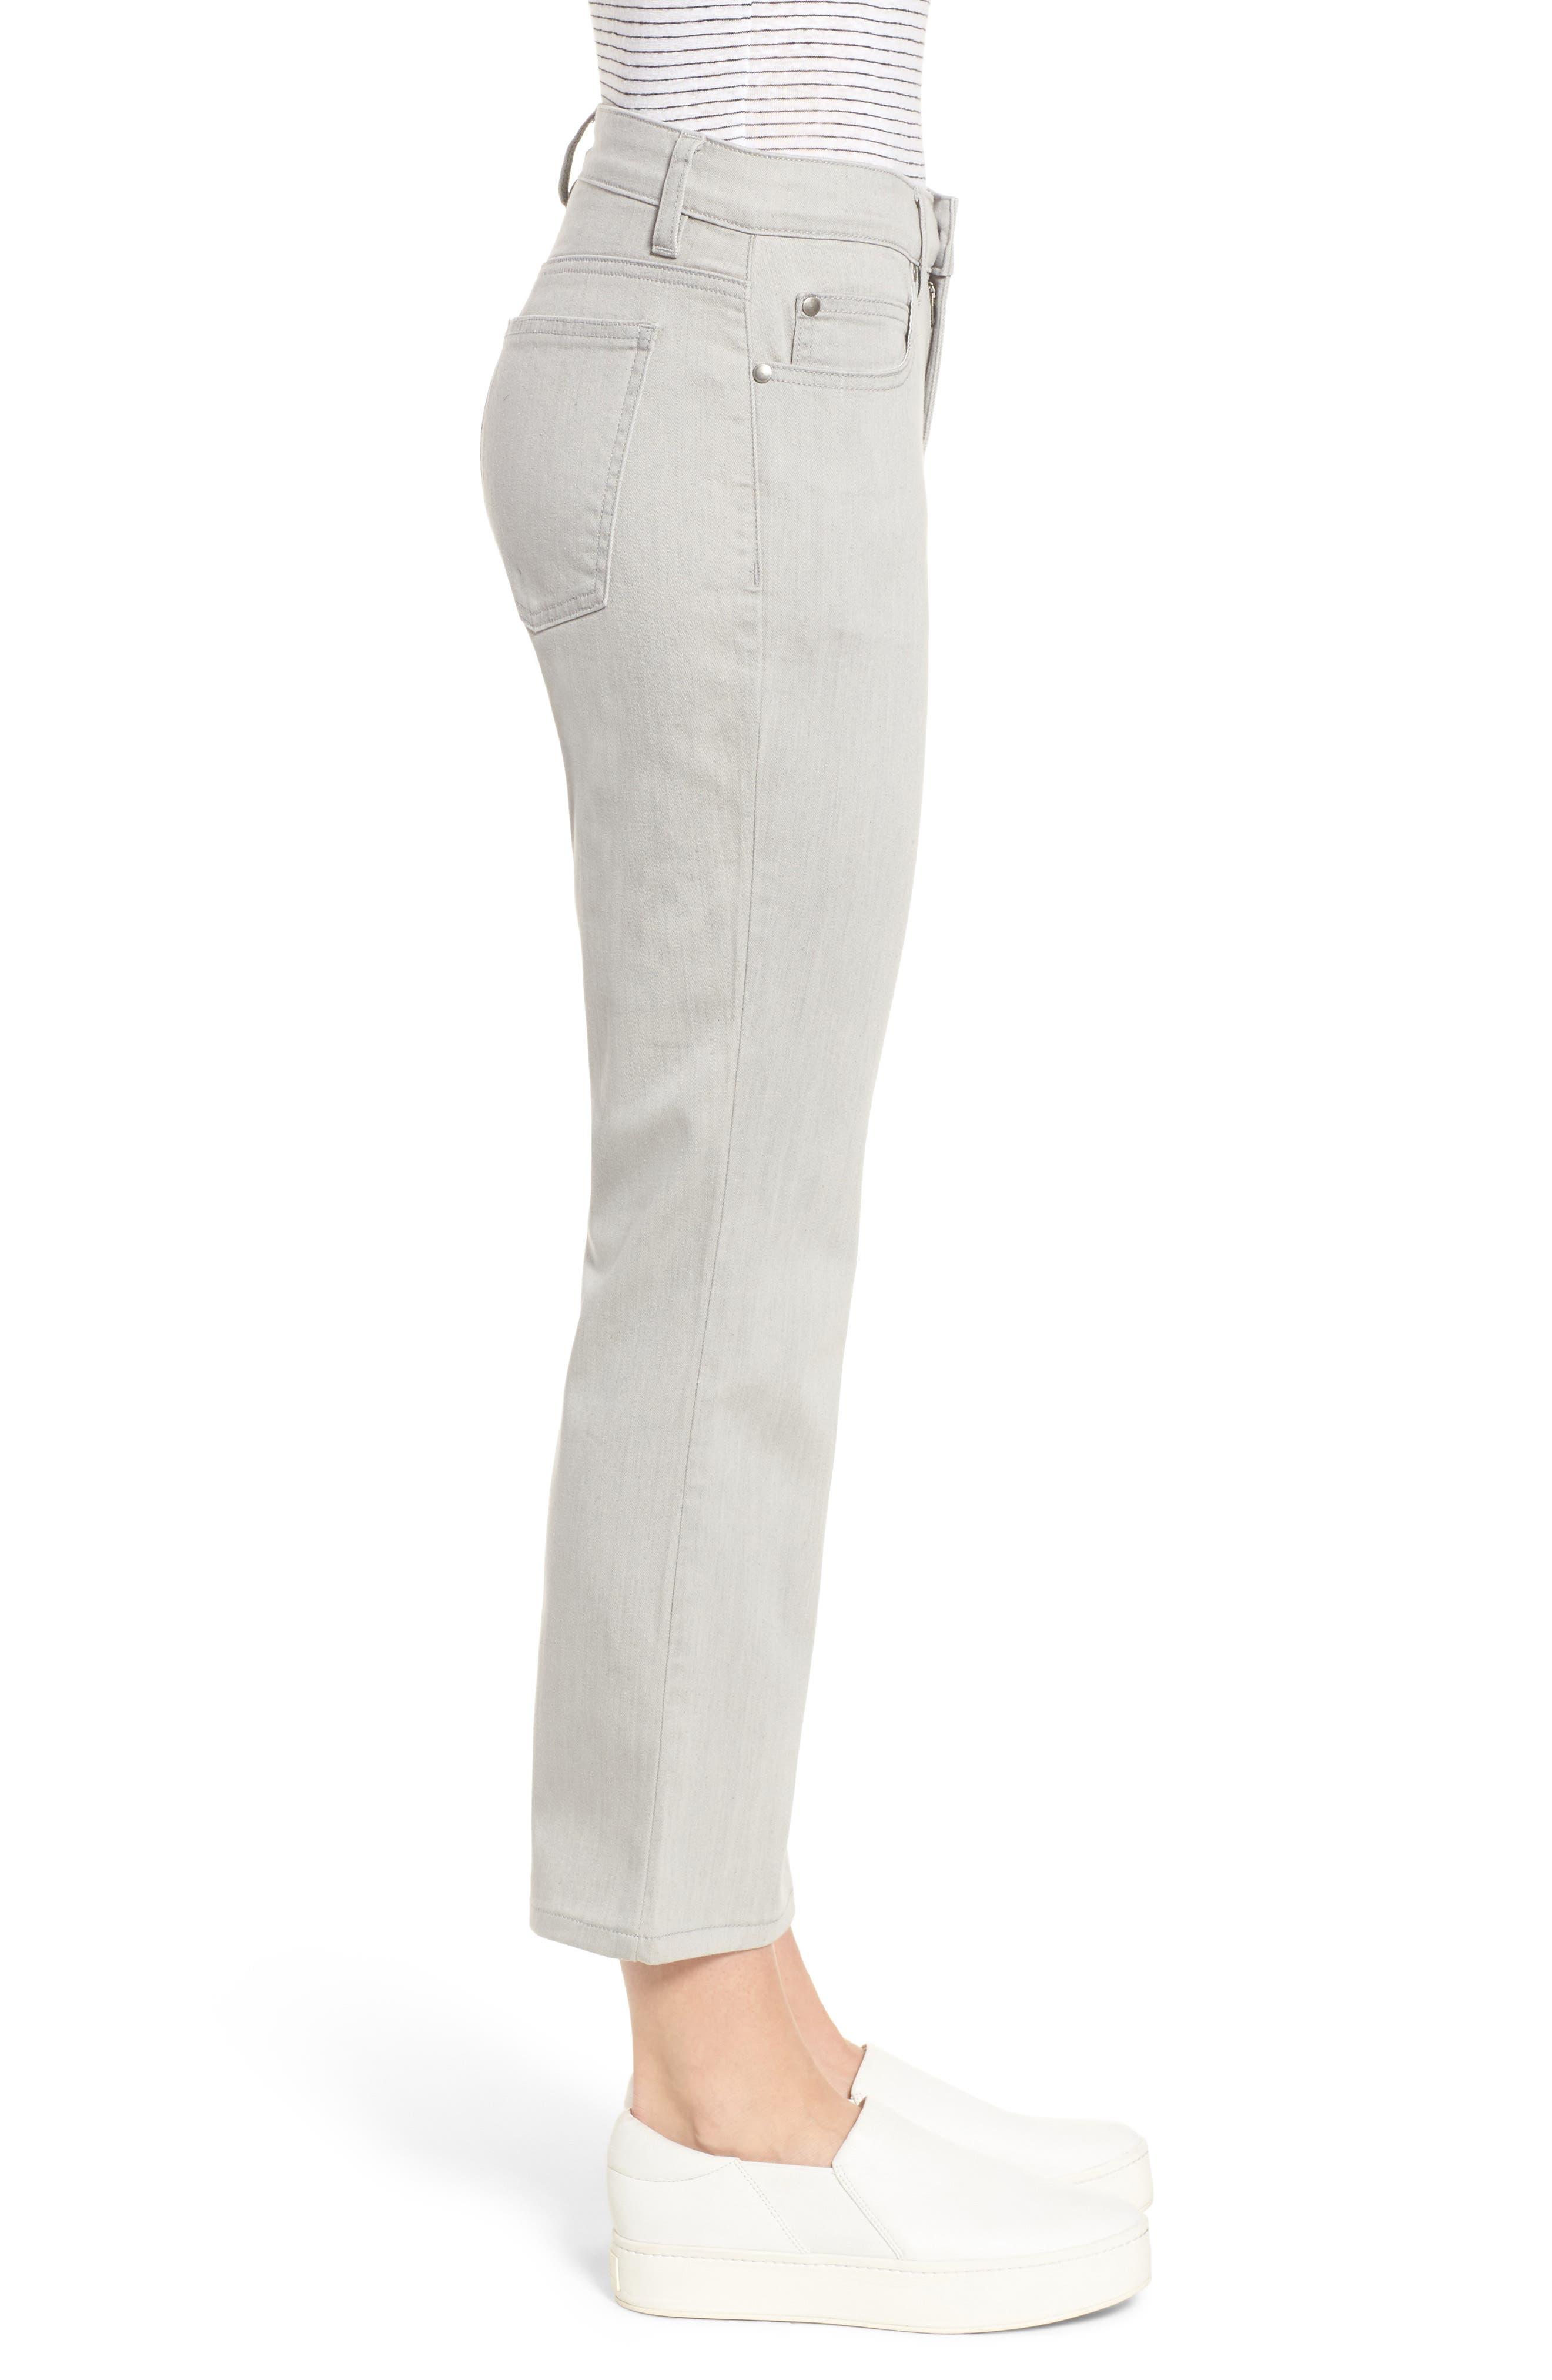 Organic Cotton Blend Crop Flare Jeans,                             Alternate thumbnail 3, color,                             Sun Bleached Gray